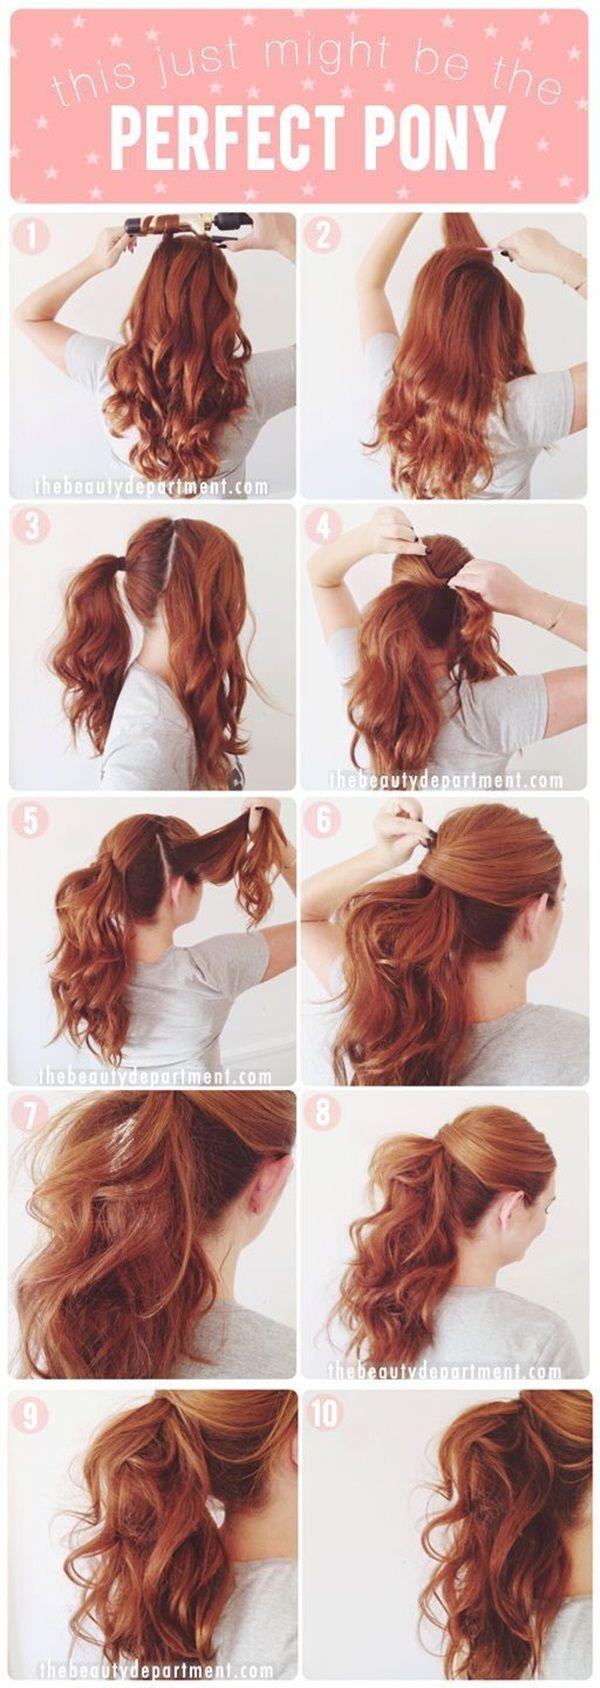 Terrific 1000 Ideas About Diy Hairstyles On Pinterest Easy Diy Short Hairstyles Gunalazisus